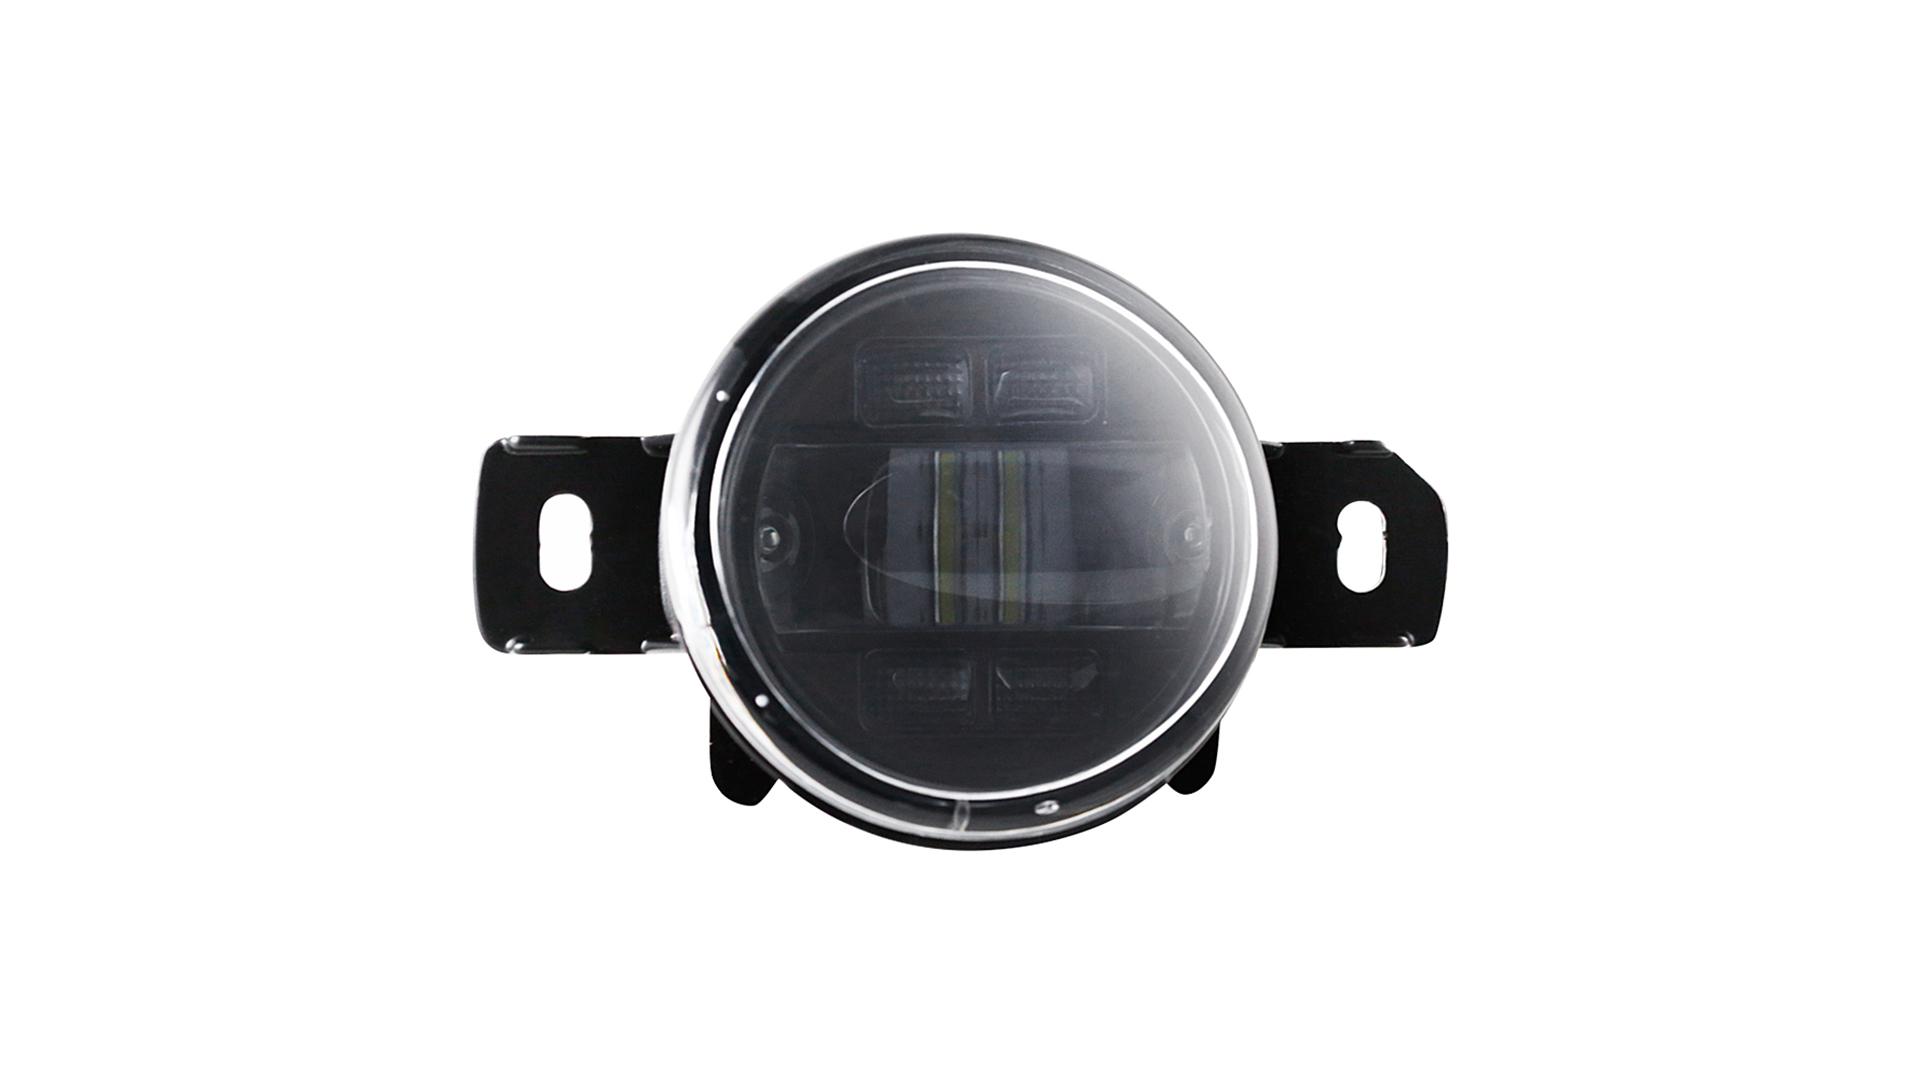 30w Led Fog Light Driving Lamps with White DRL Amber Turn Signal Kit For Nissan Teana Duke 2008-2015